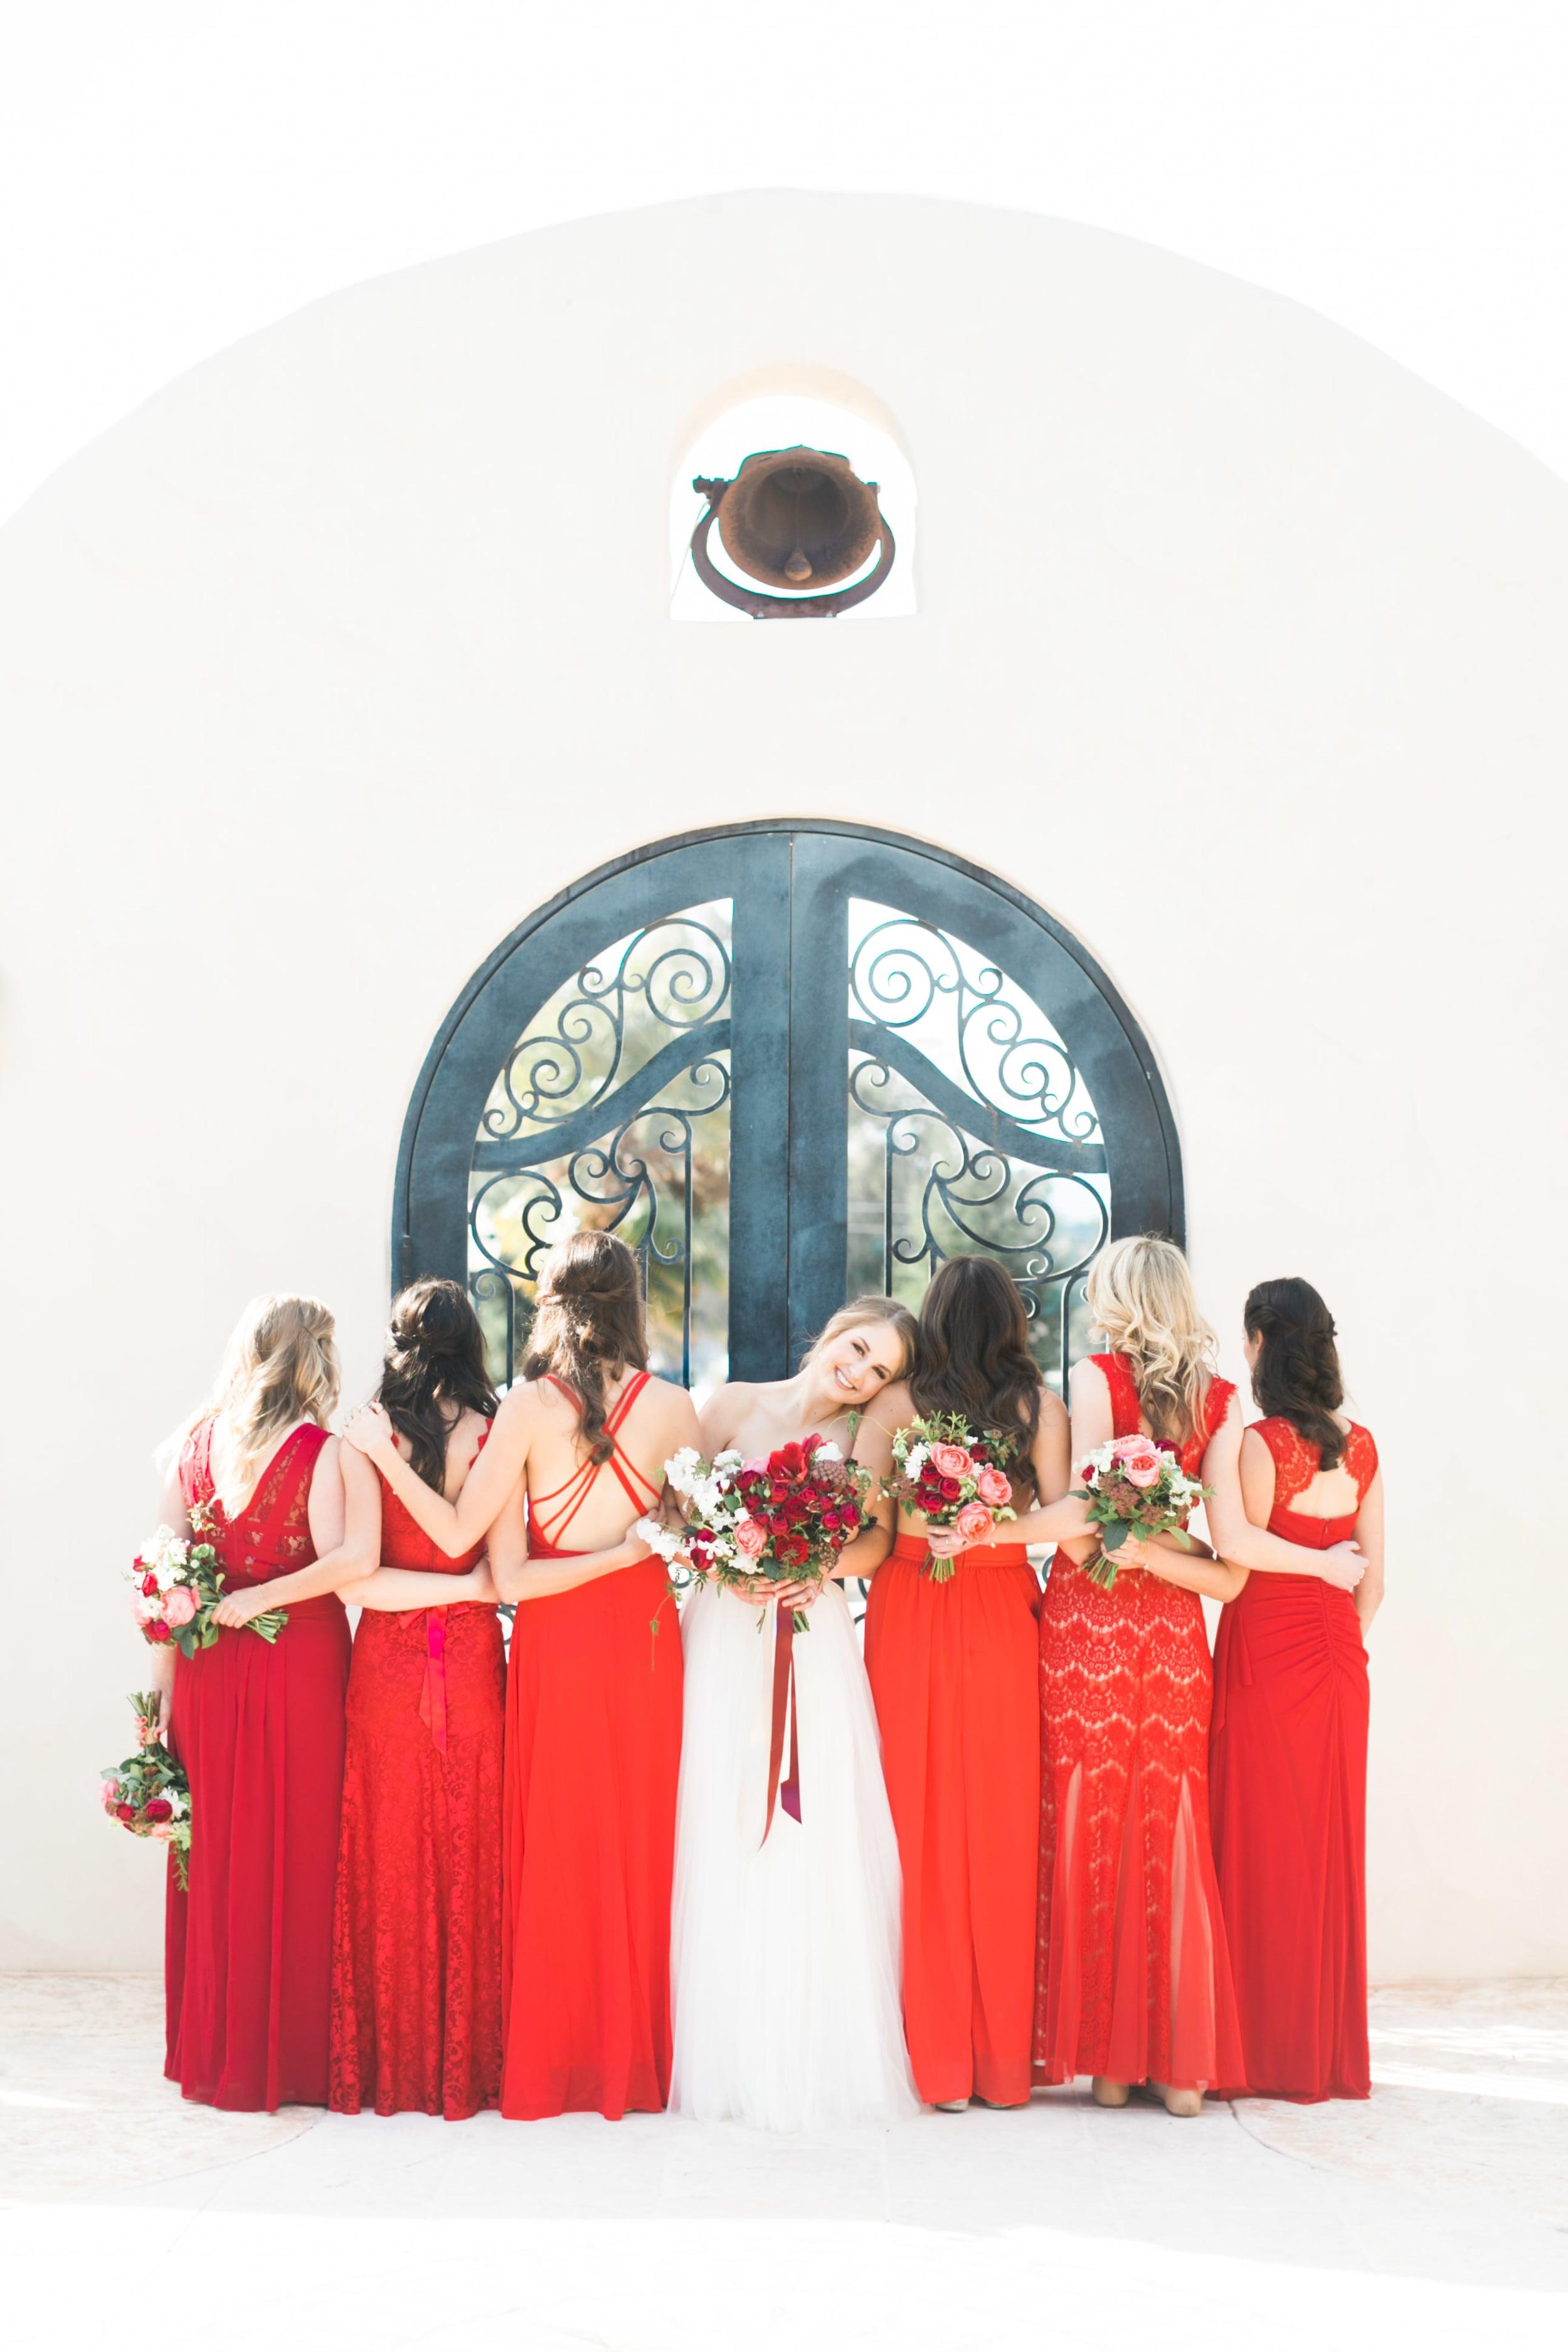 Natalie_Schutt_Photography_Winter_Wedding_San_Luis_Obispo-52.jpg